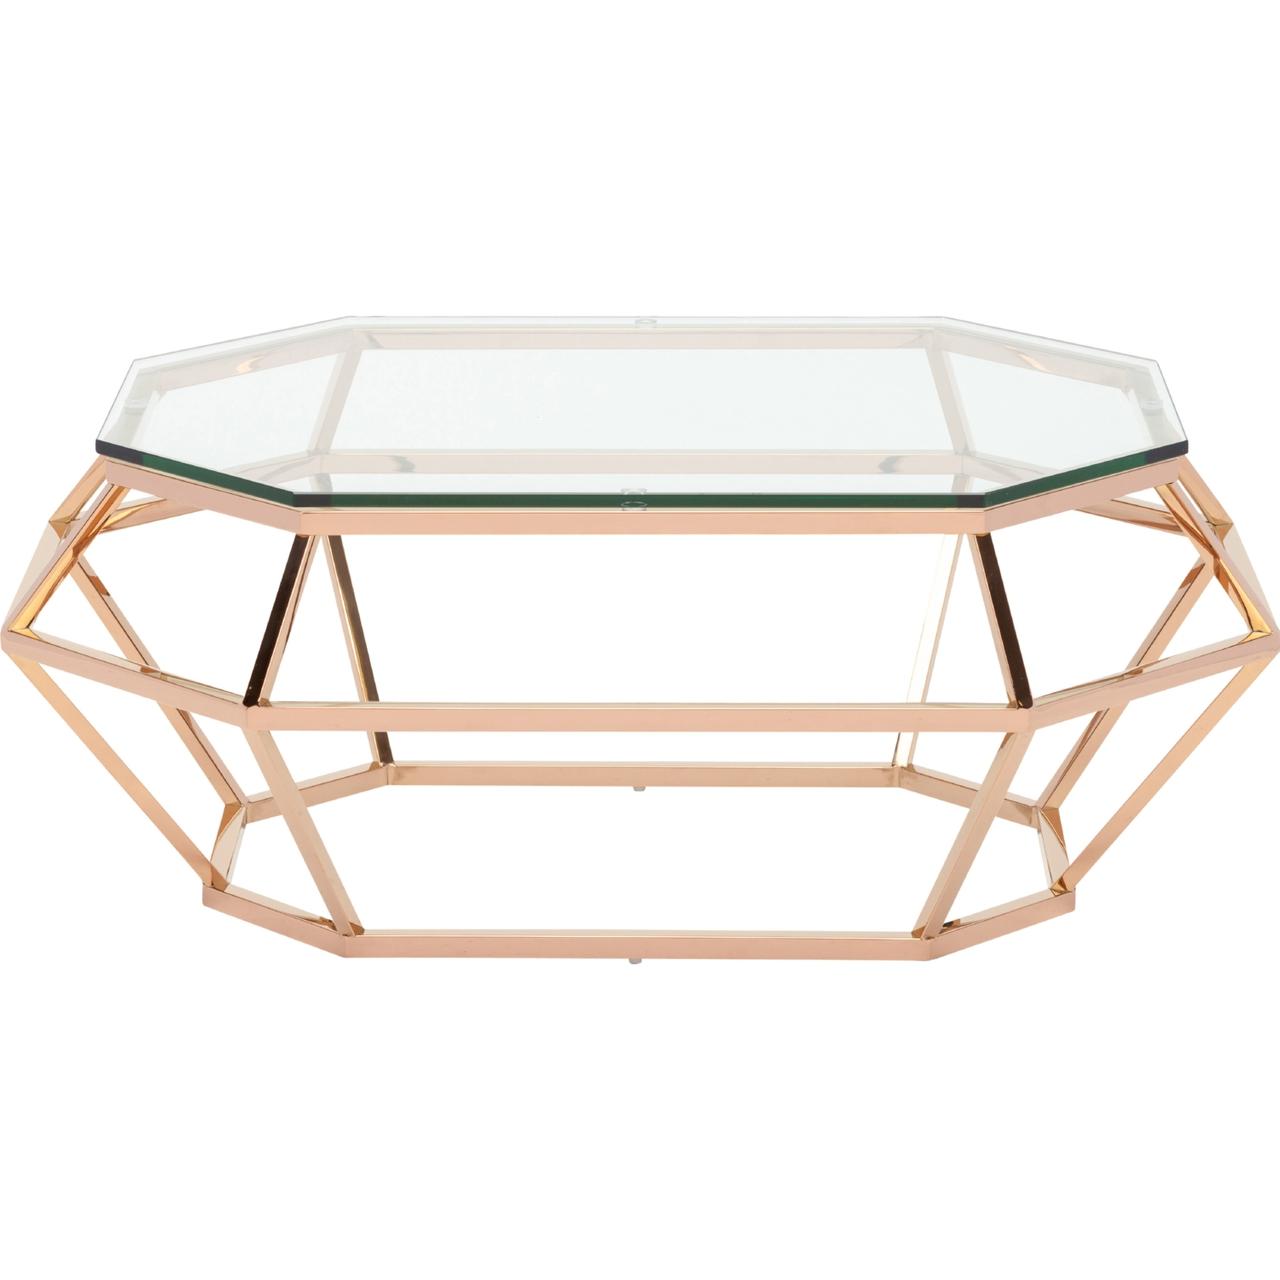 Coffee Table X Shaped Base